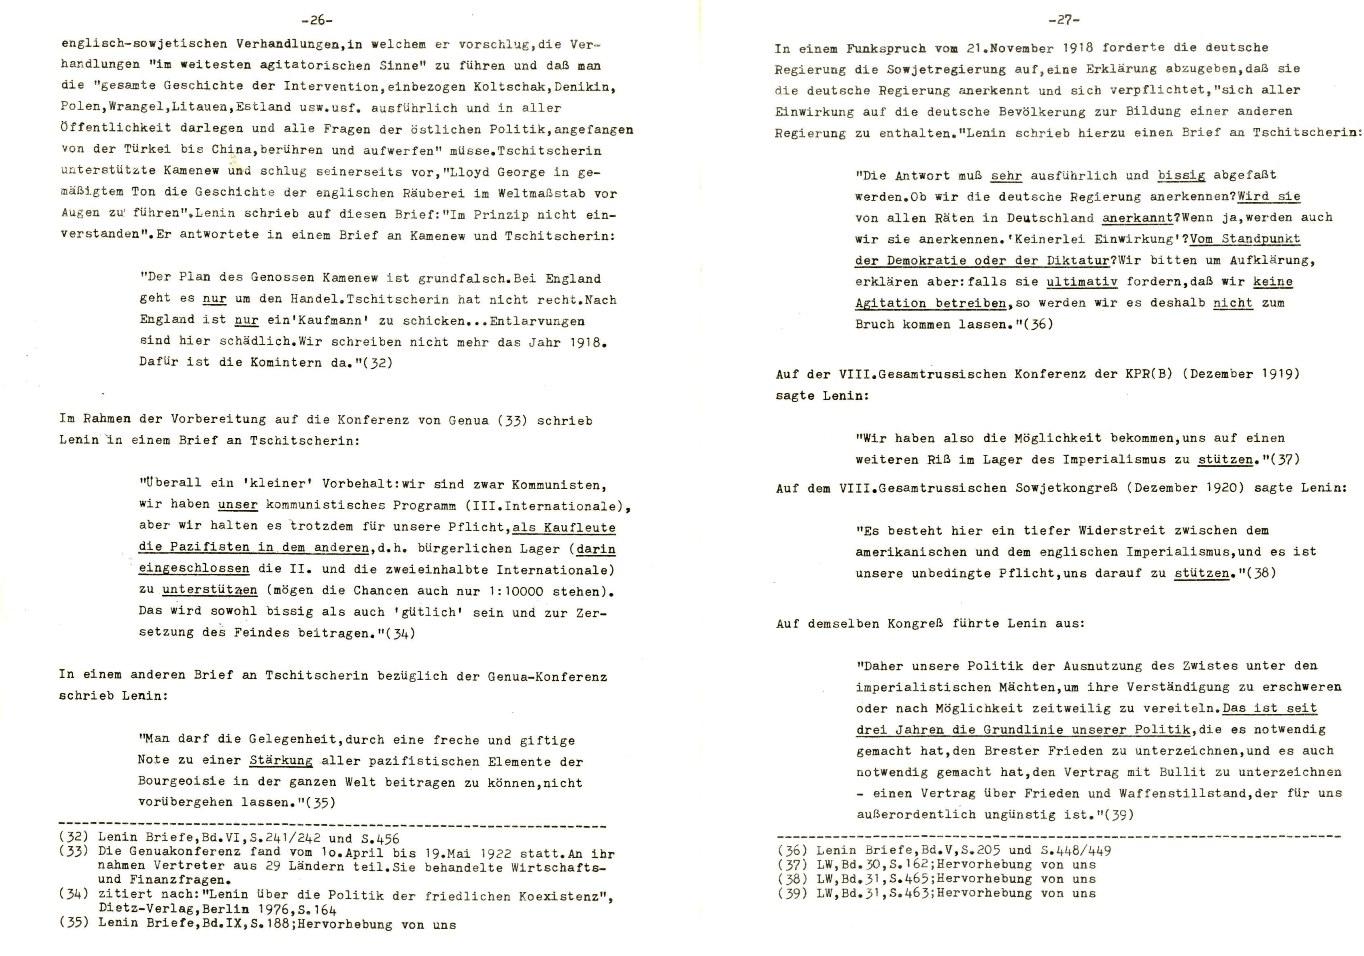 Muenchen_Kampf_dem_Revisionismus_1978_04_05_15